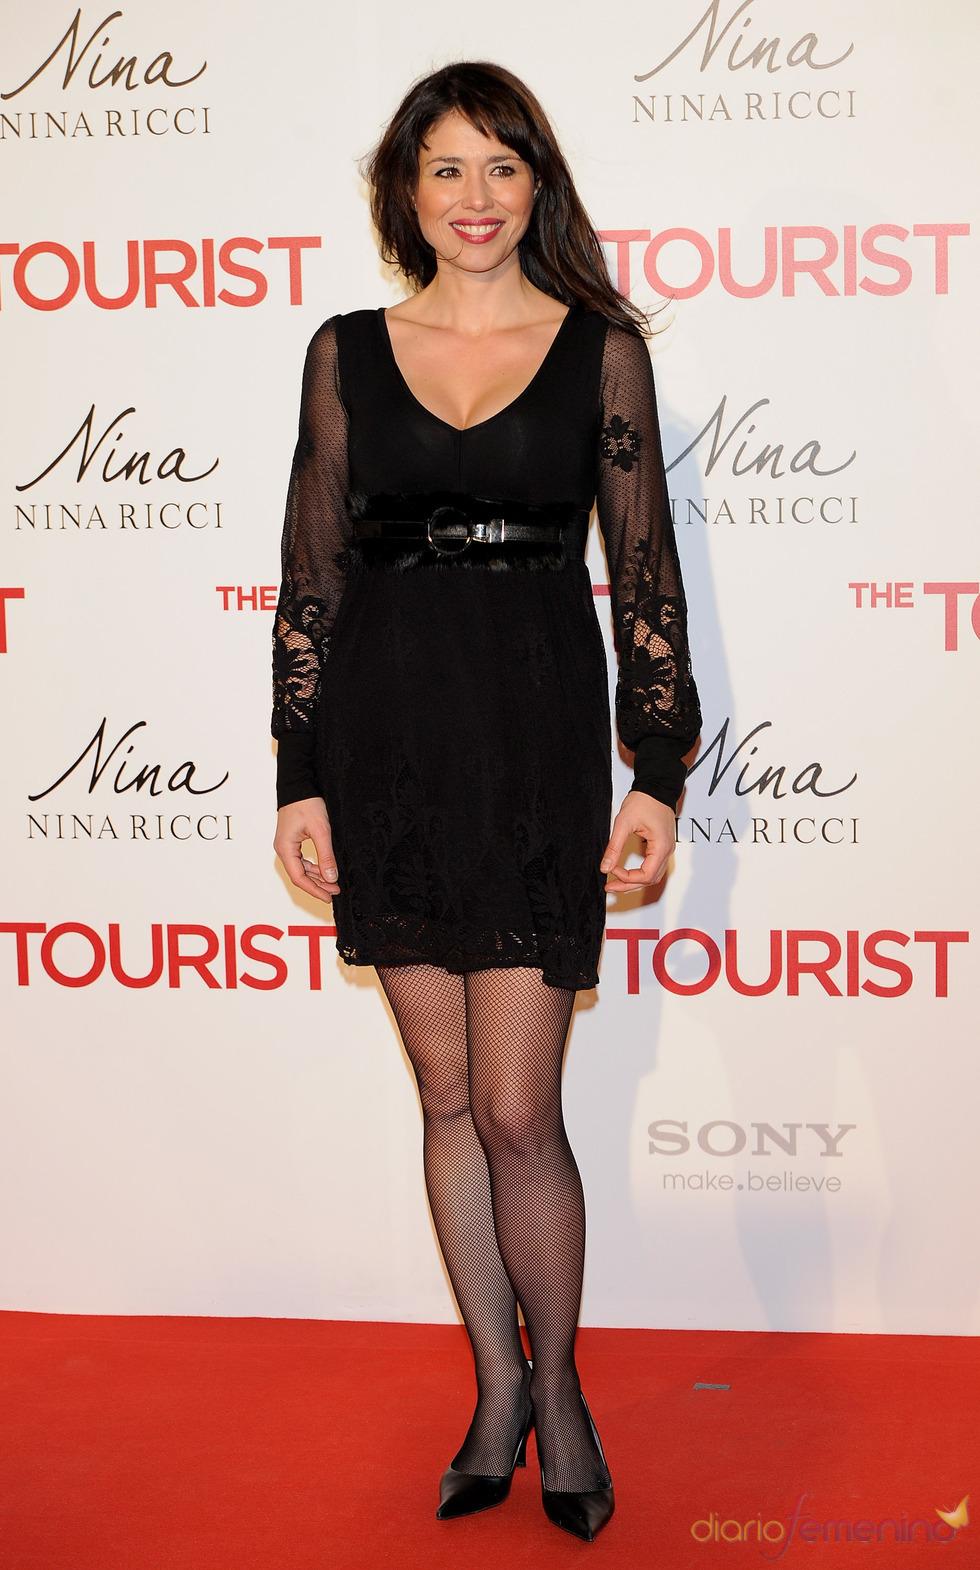 Minerva Piquero en la premiere de 'The Tourist' en Madrid